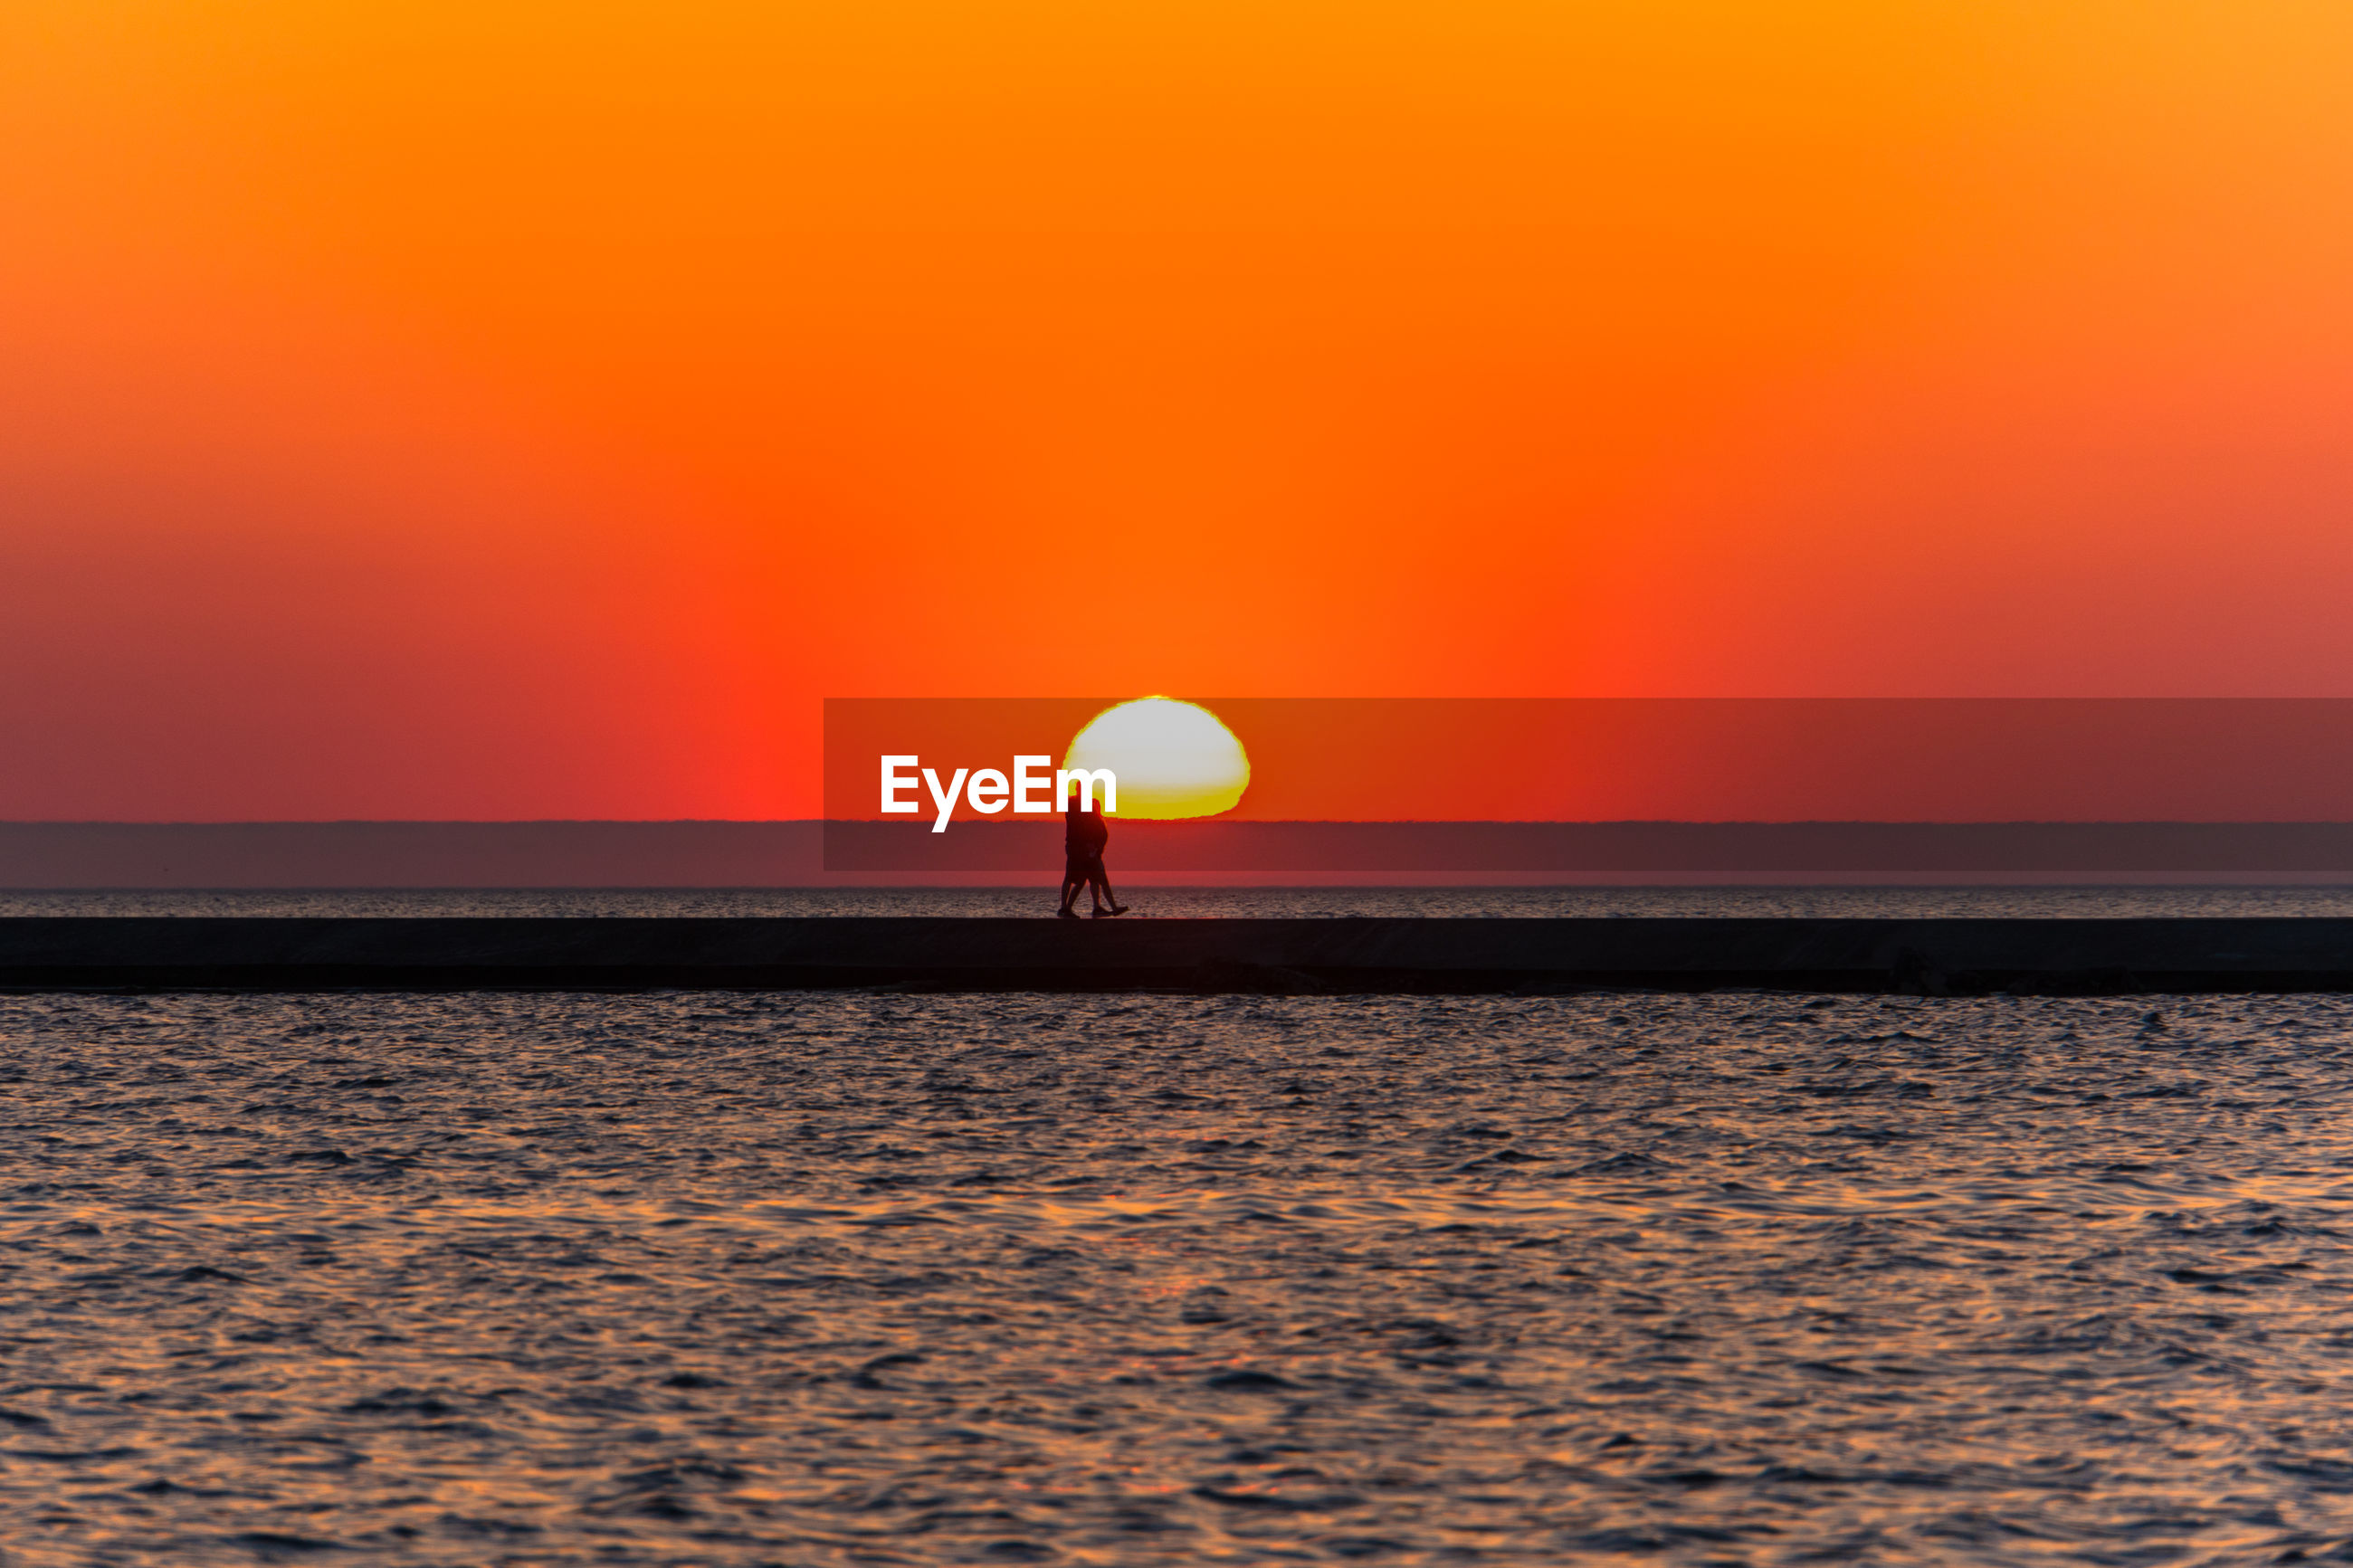 SILHOUETTE SEA AGAINST ORANGE SKY